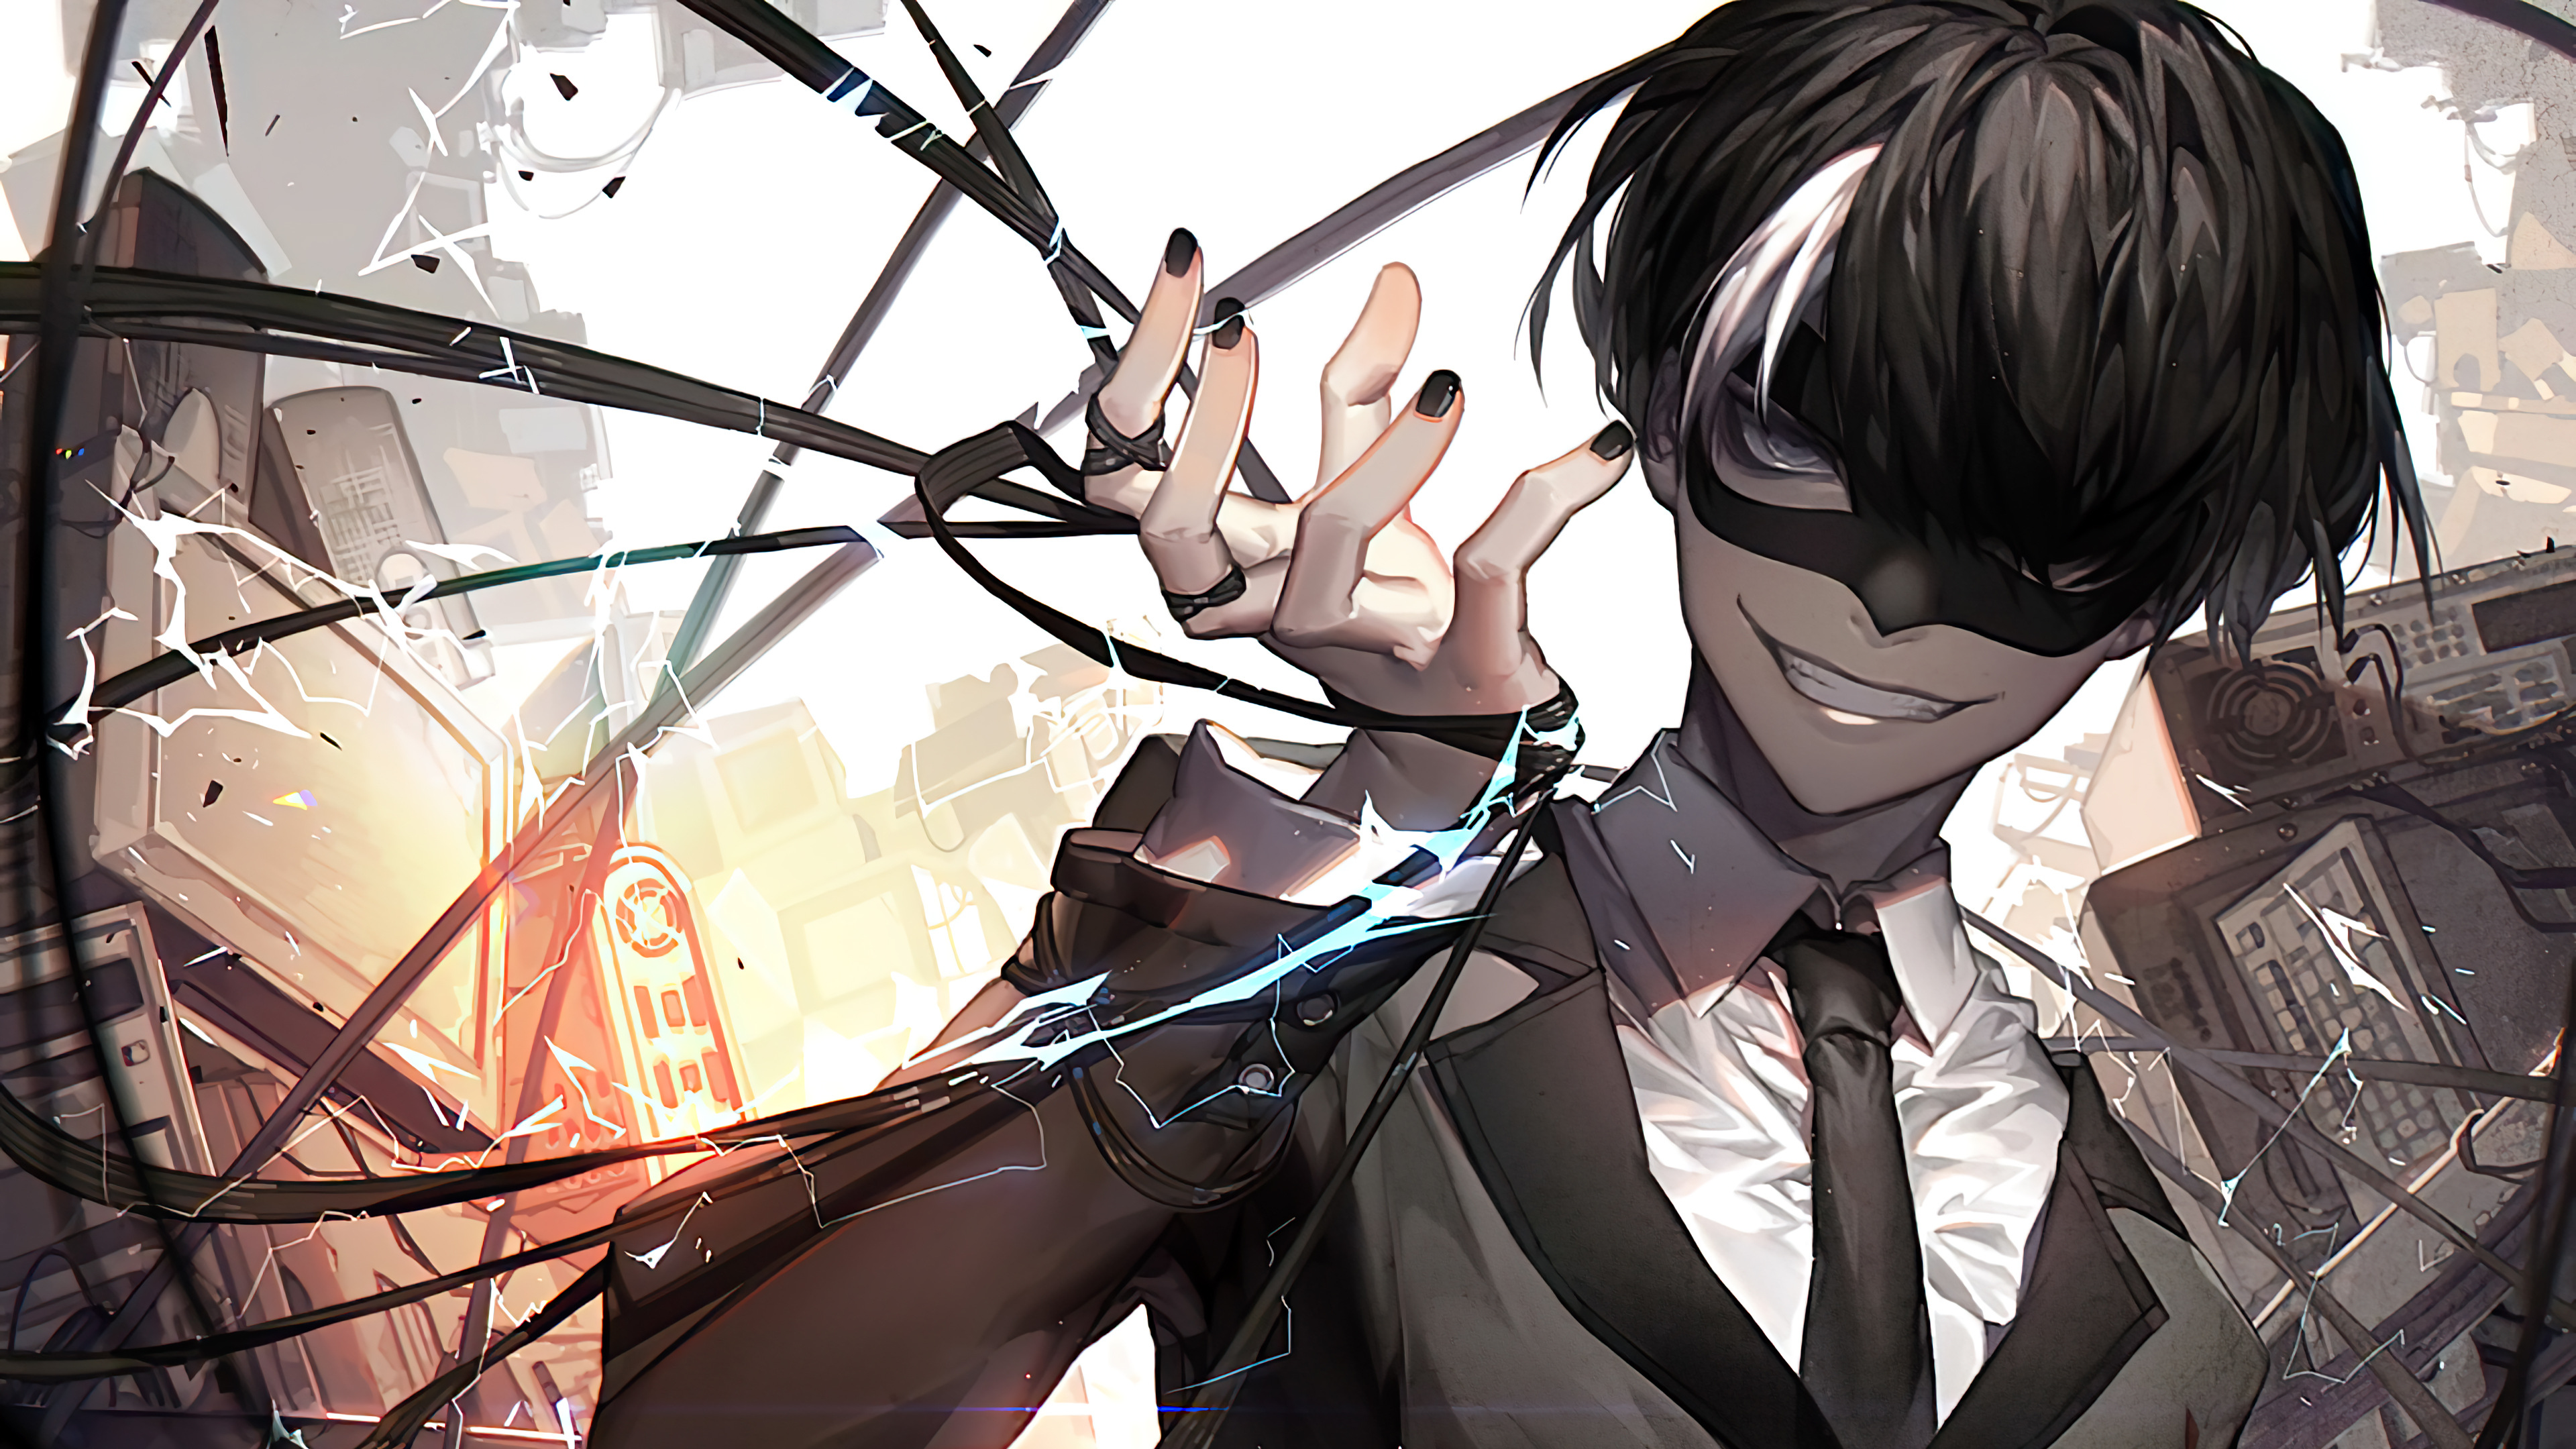 Fondos de pantalla Anime Tao de Noblesse